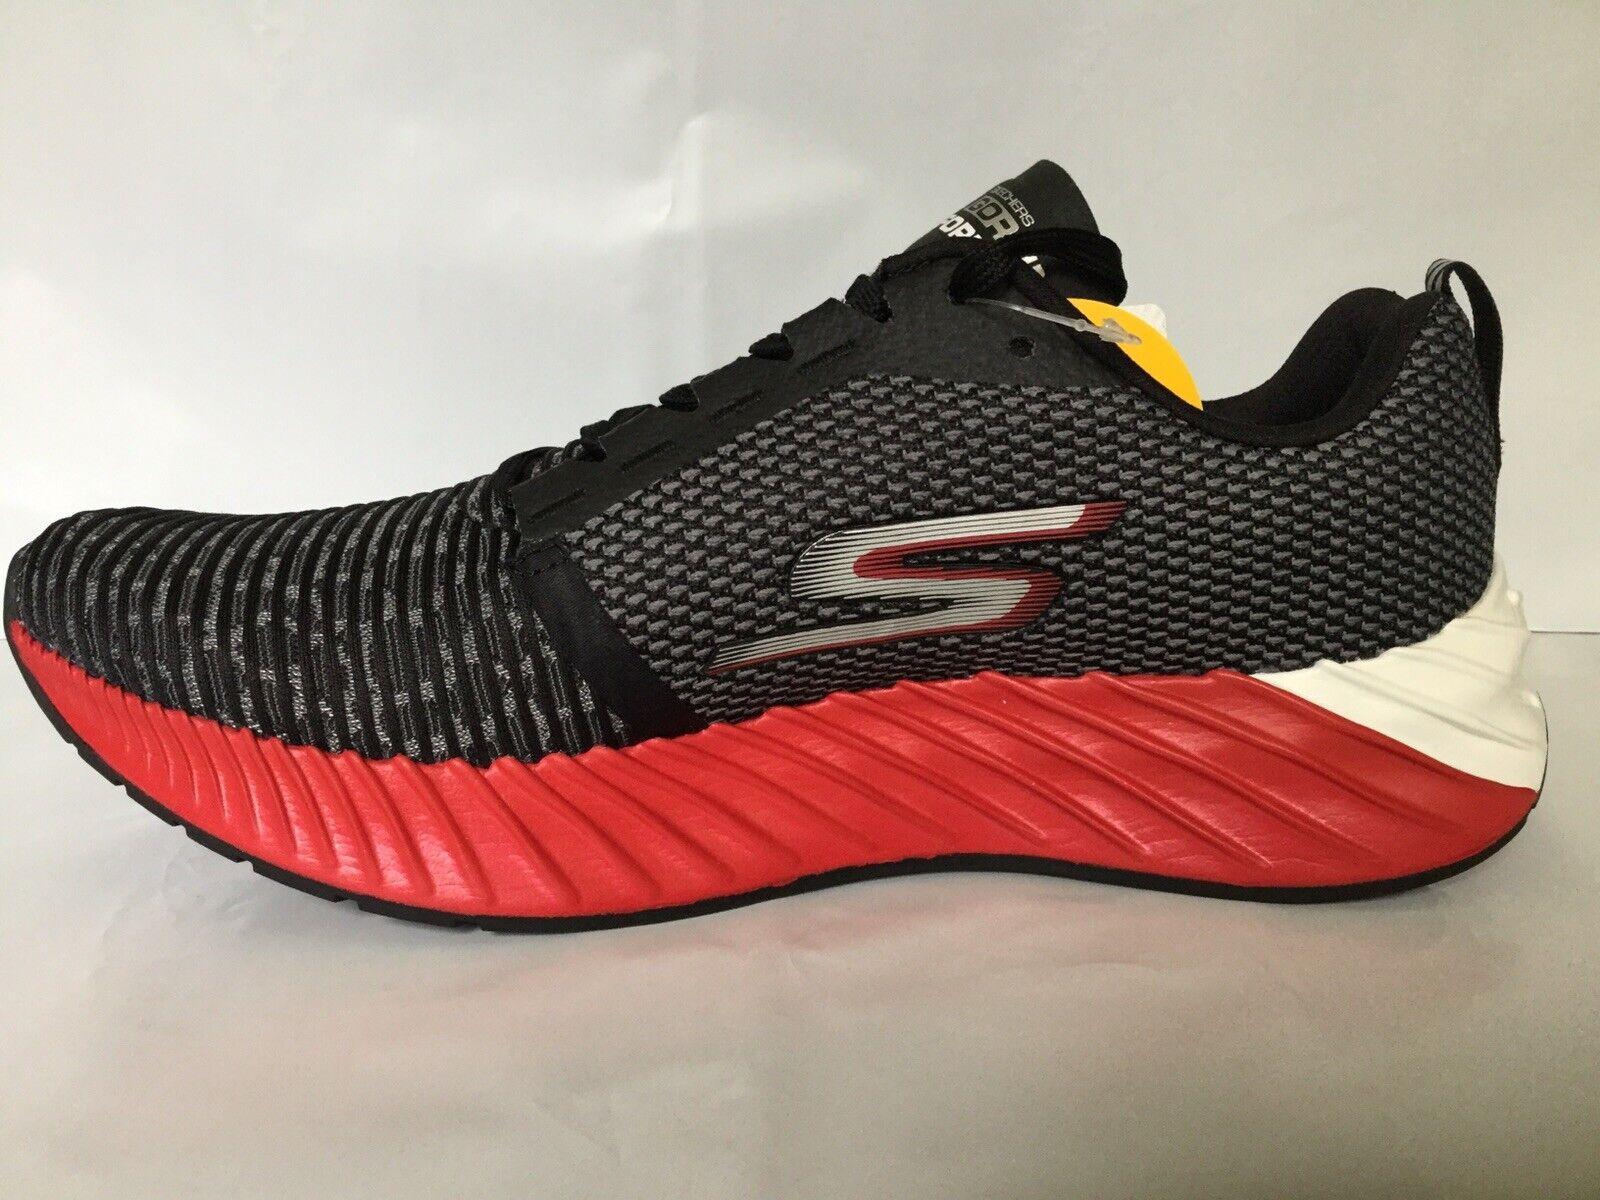 NEW Skechers Men/'s GORUN 400 DISPERSE Running Shoes Char//Red #54353 161M tz